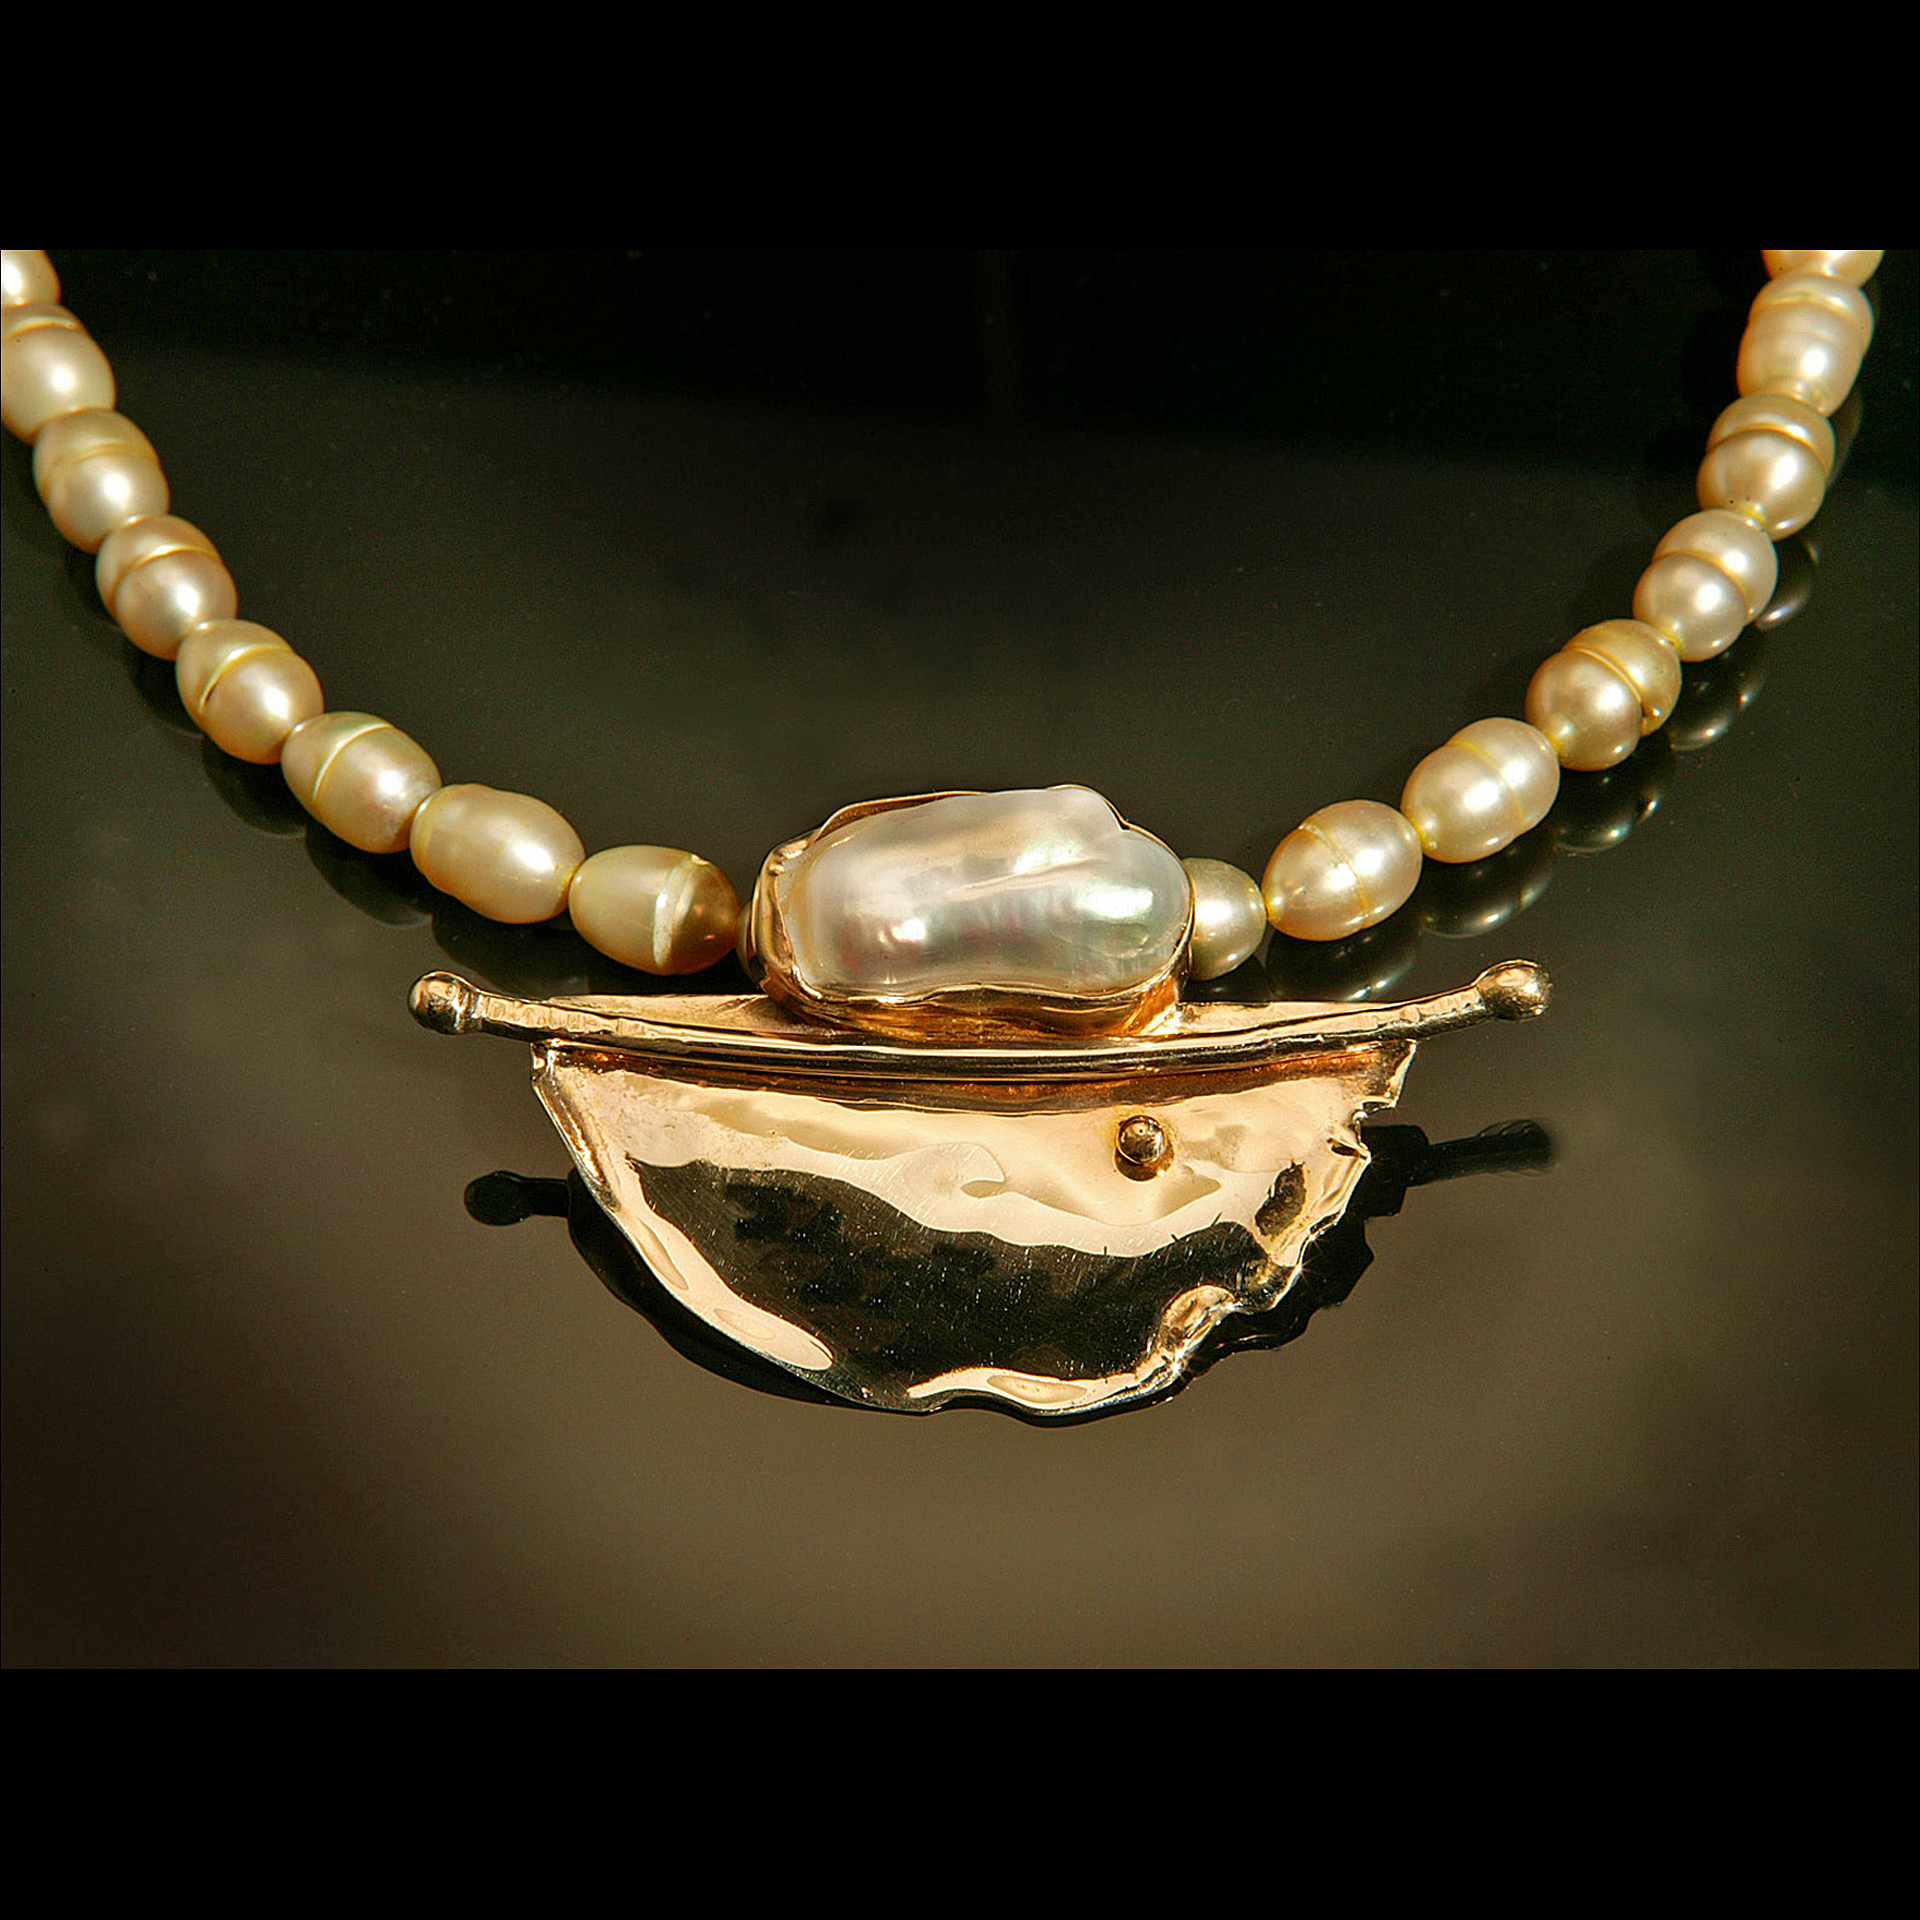 sue brown gordon - jewelry slide 5.jpg